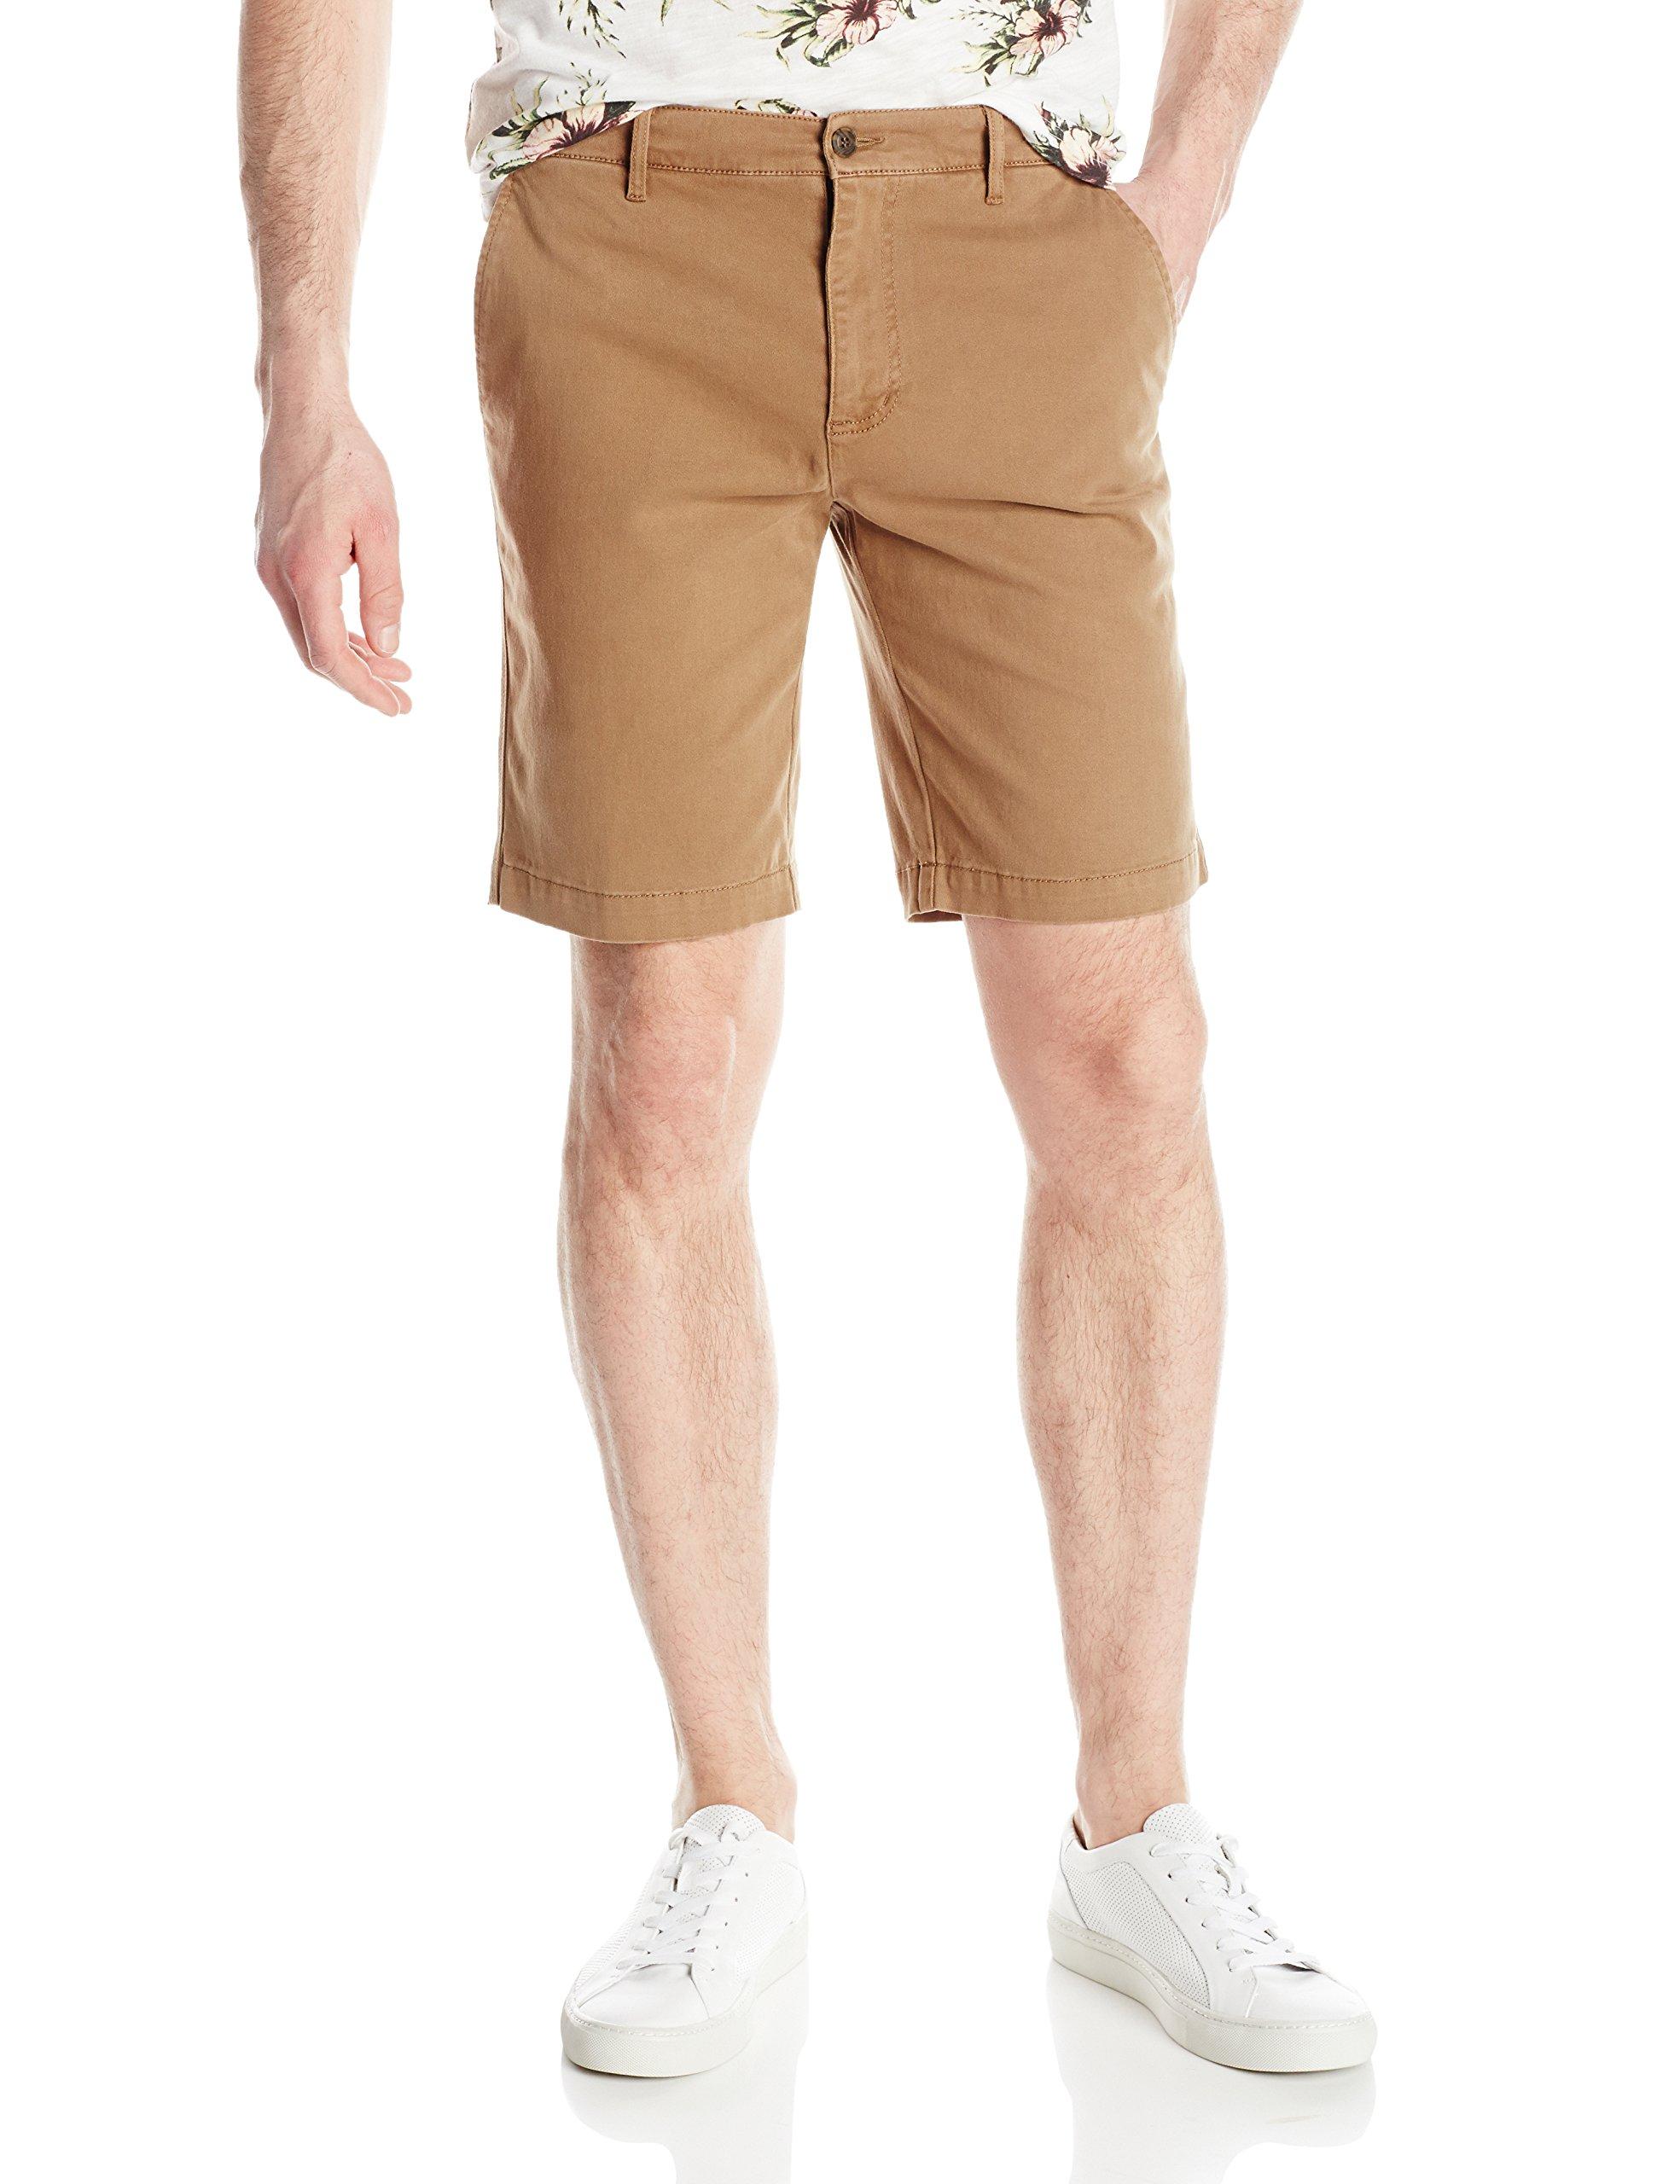 Michael Stars Men's Vintage Twill Short, Khaki, 30